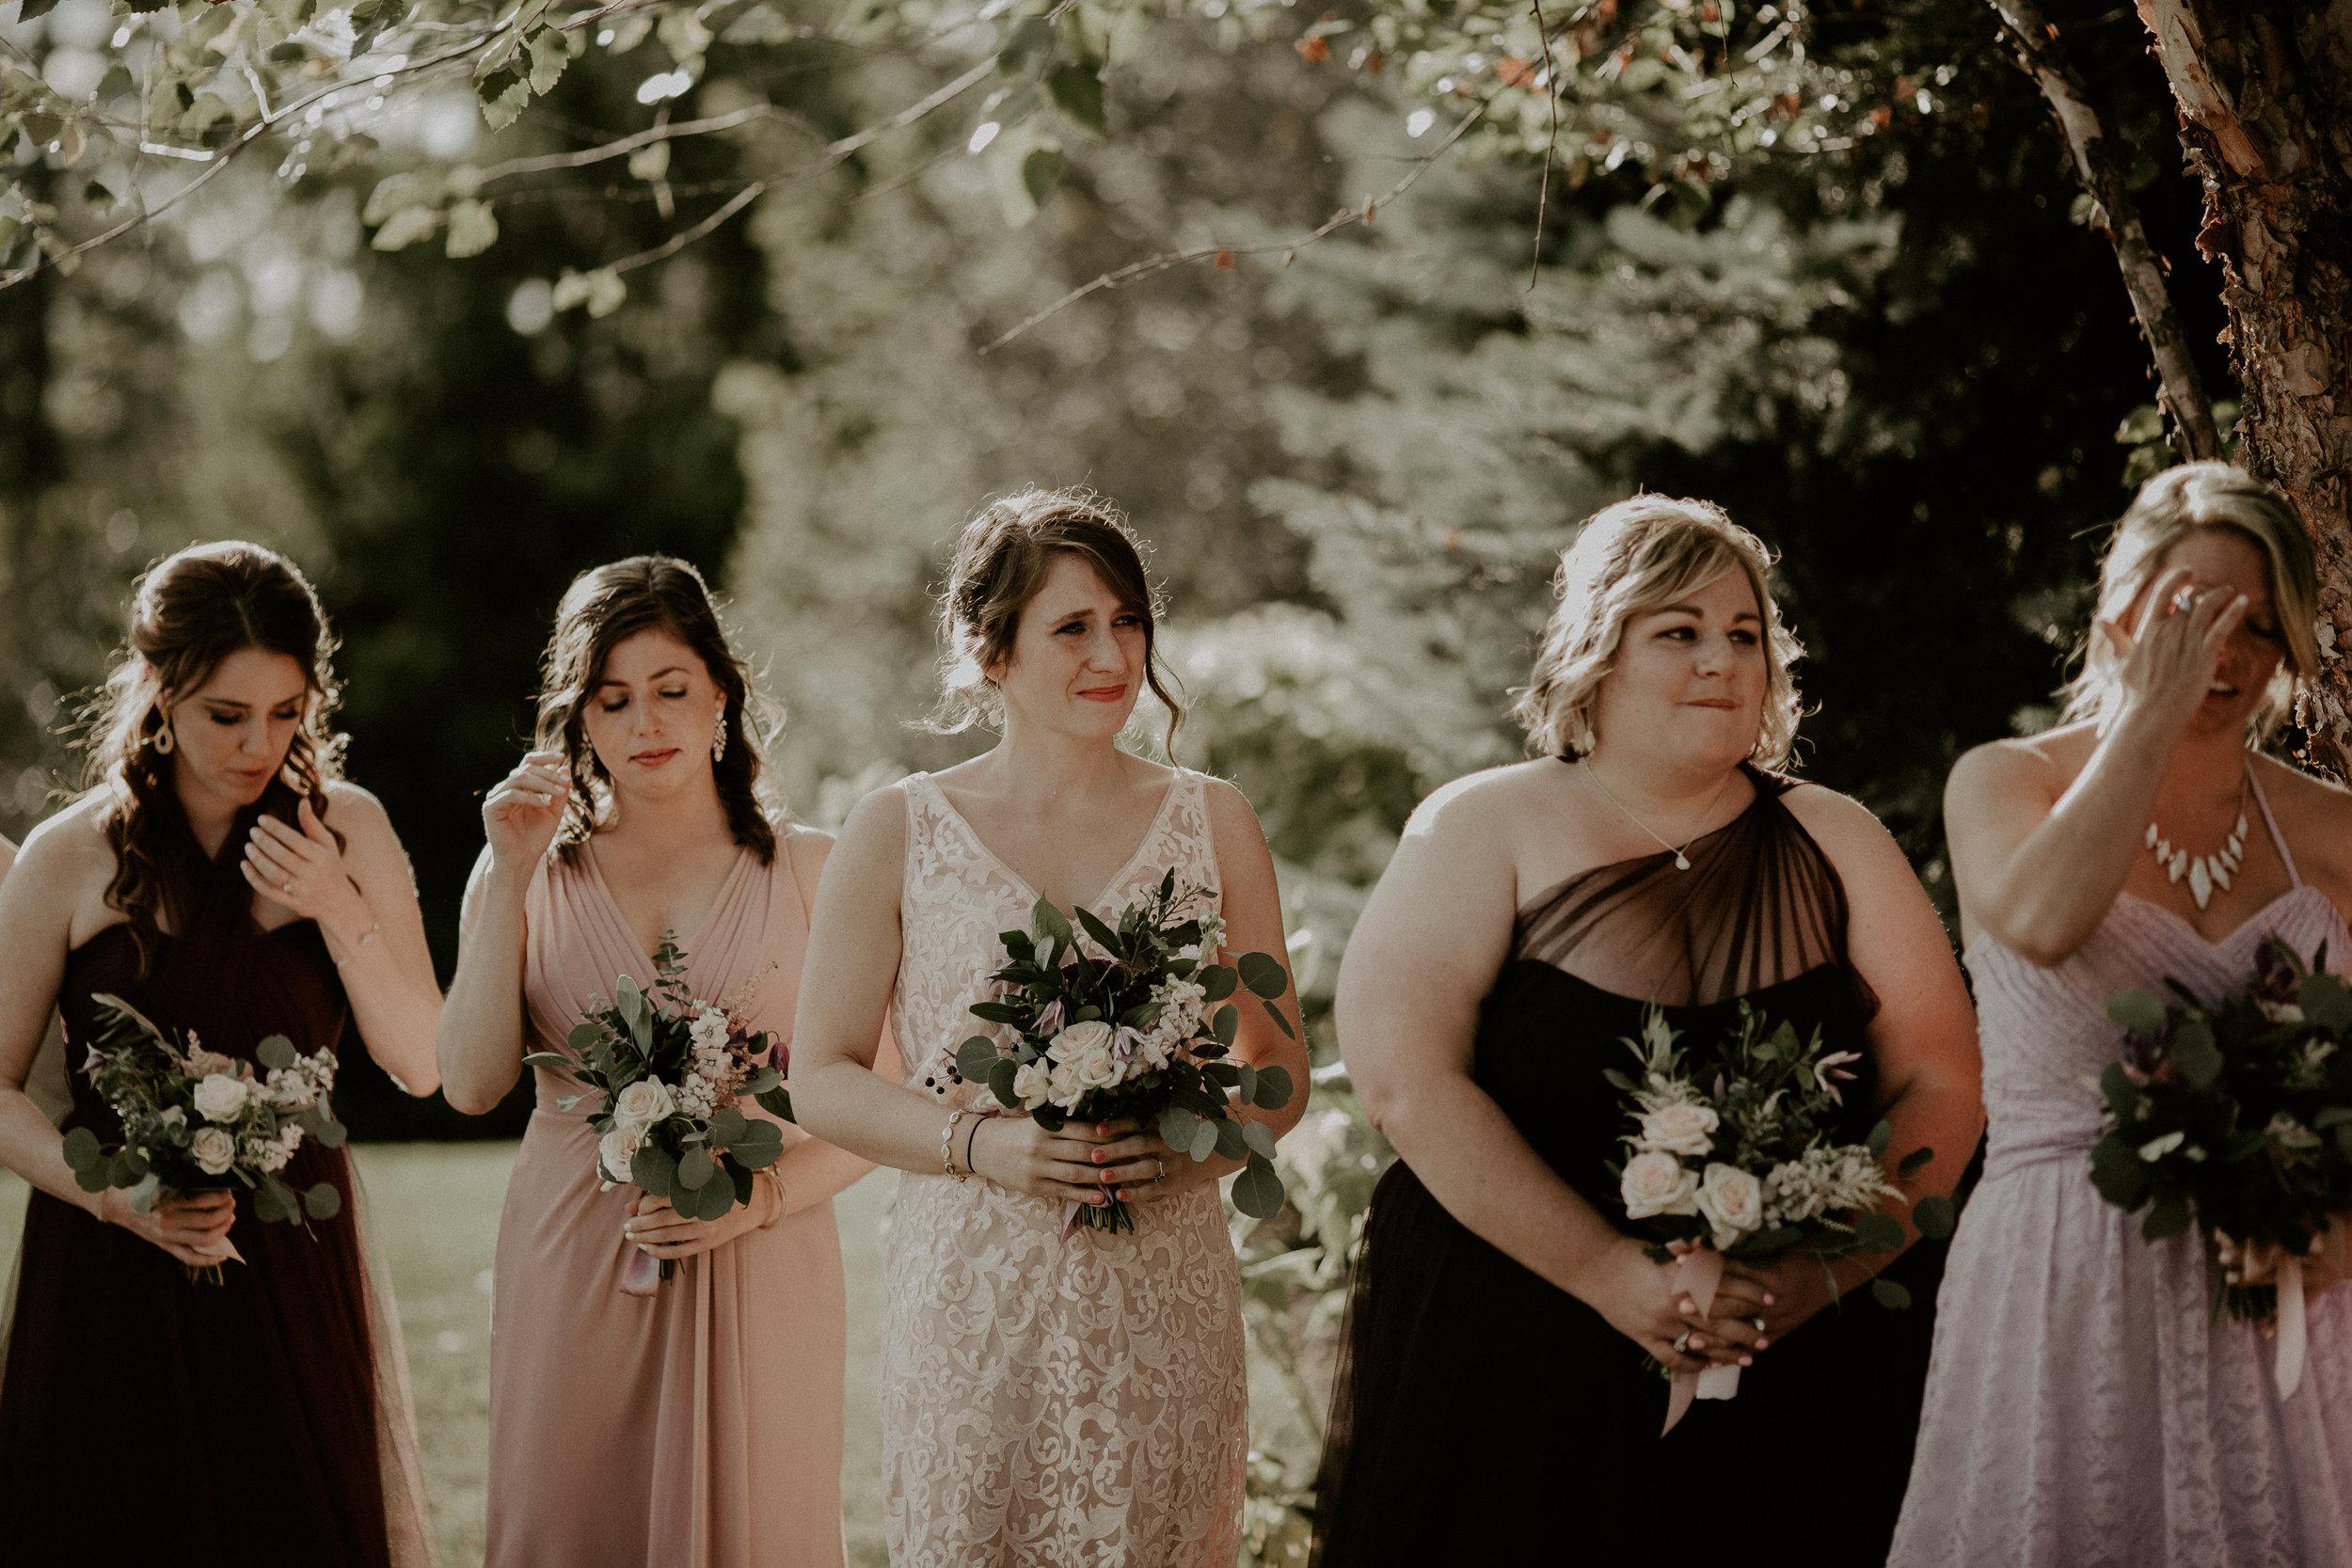 Thorncreek_Winery_Wedding_Kat_Matt-522.JPG